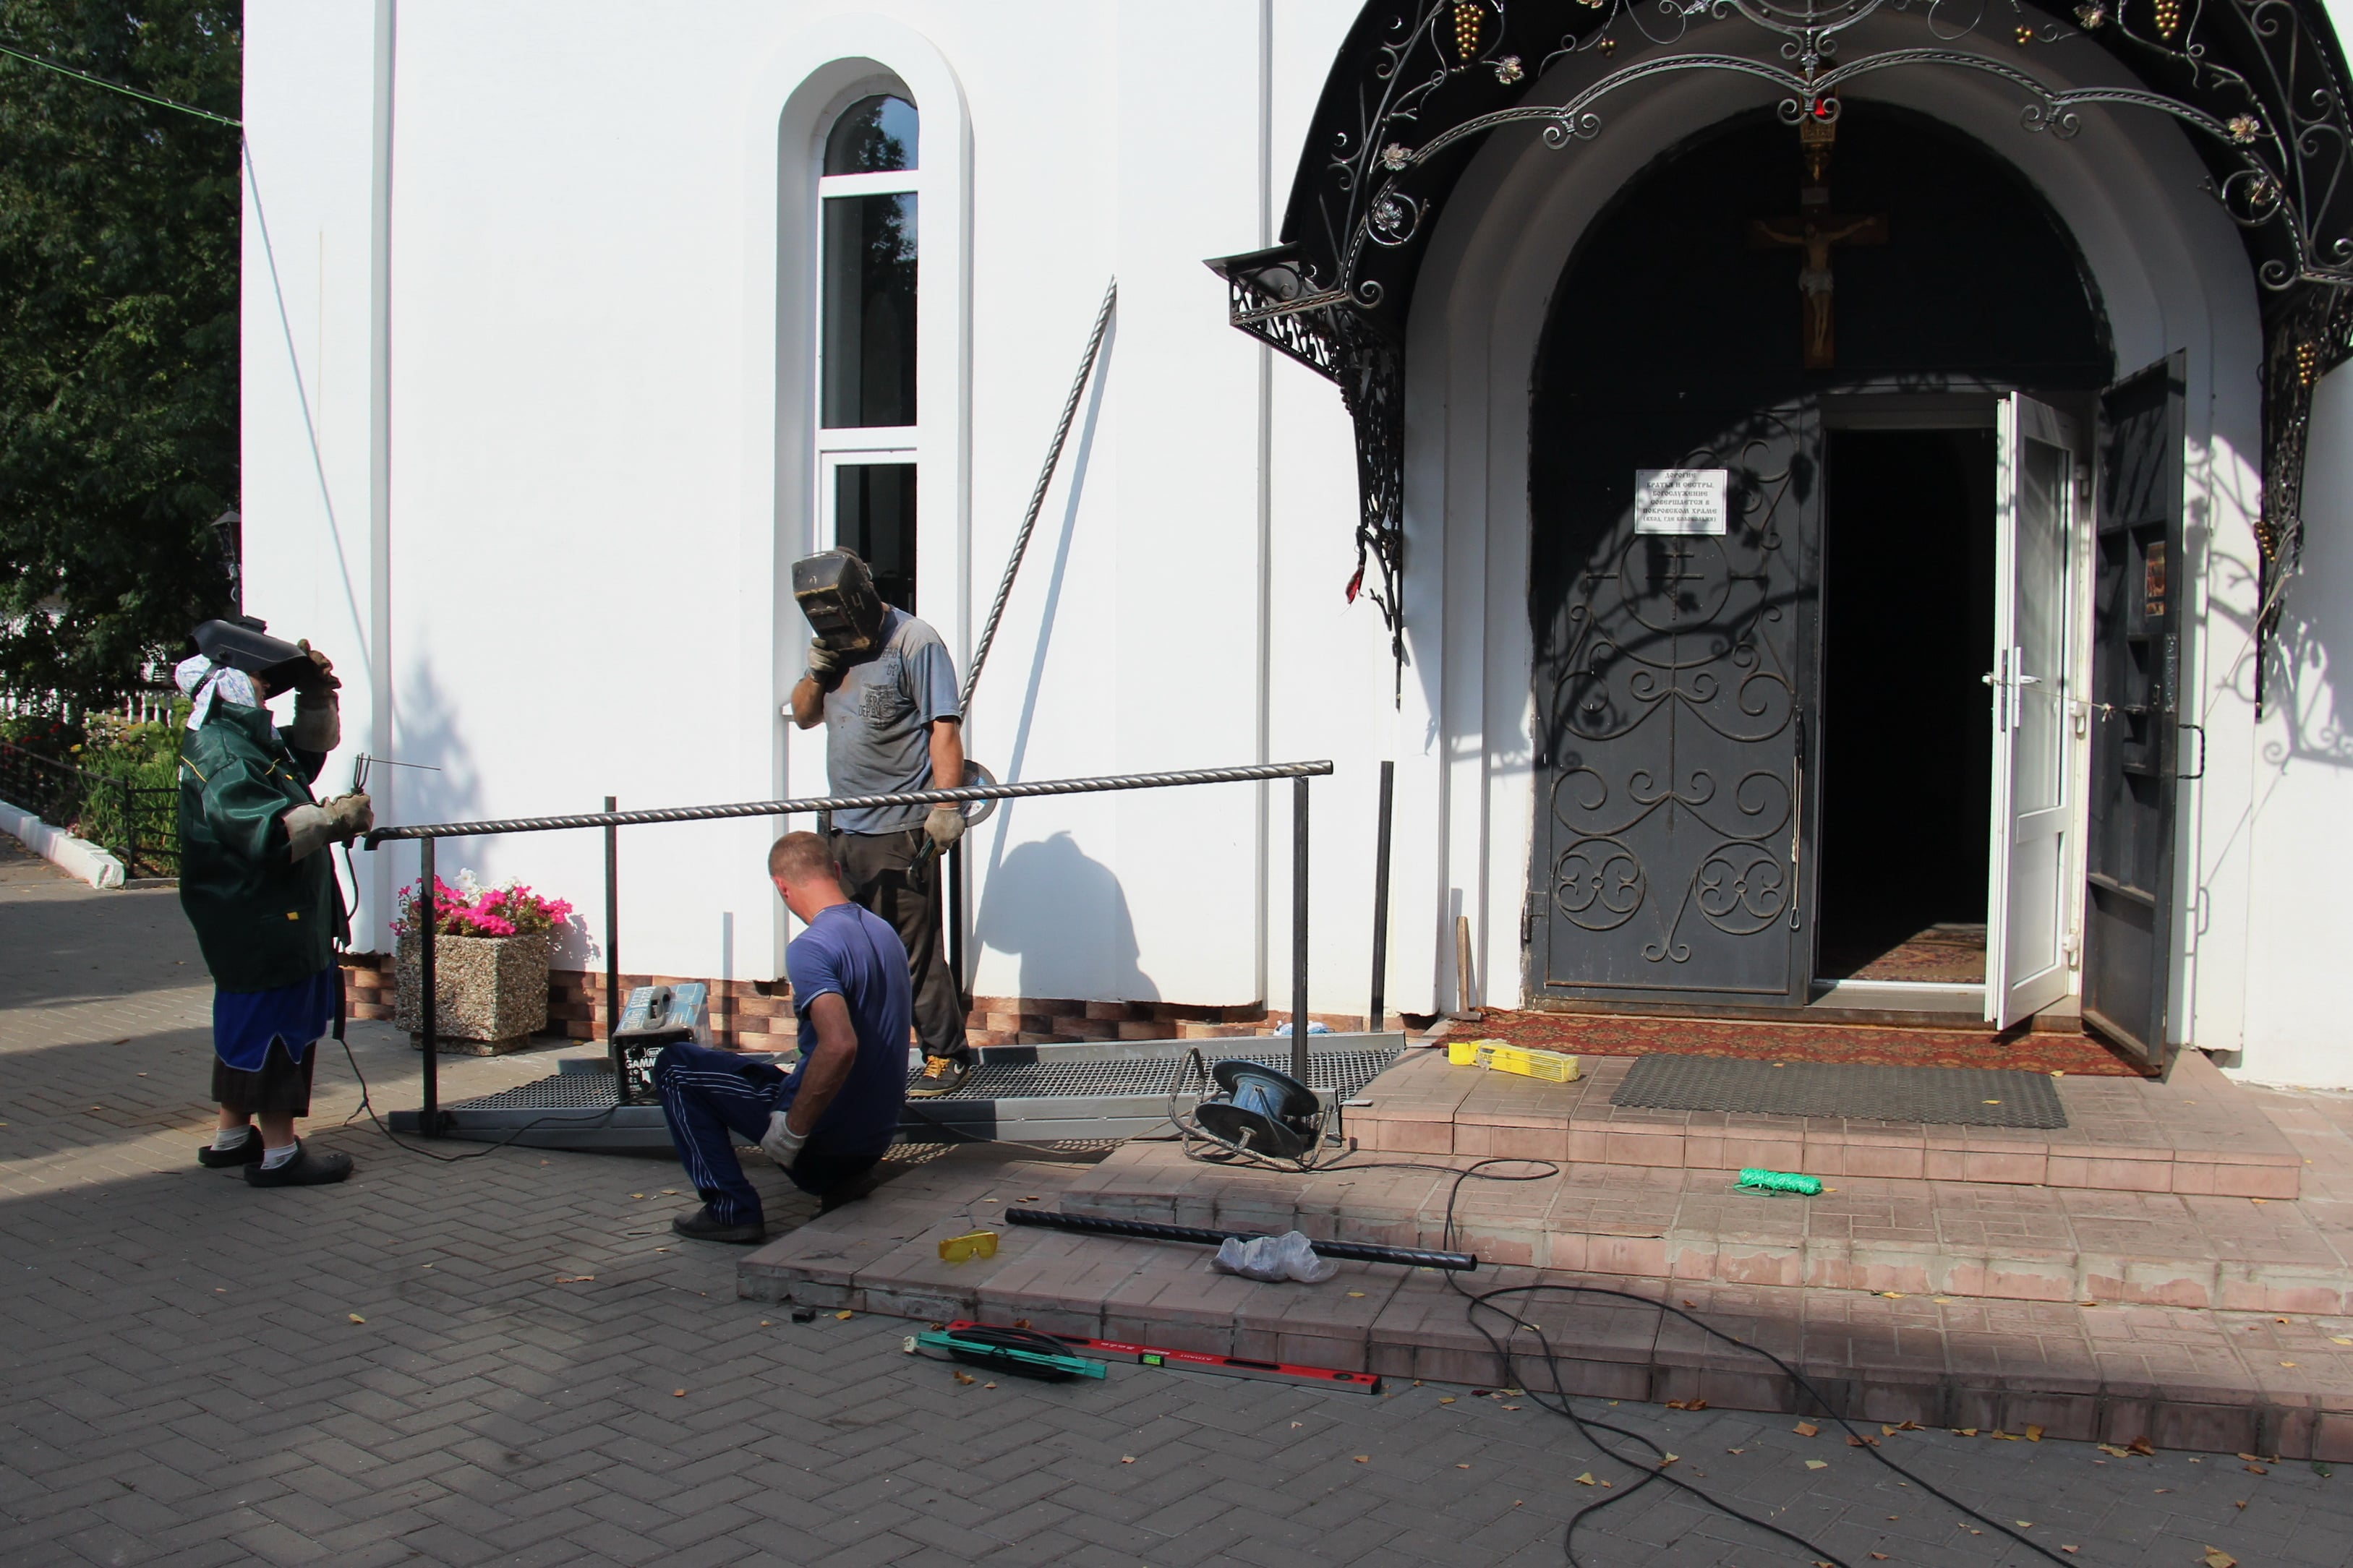 http://monuspen.ru/photoreports/9df63e5e9d77c5739c4060bc33b07f8l.JPG